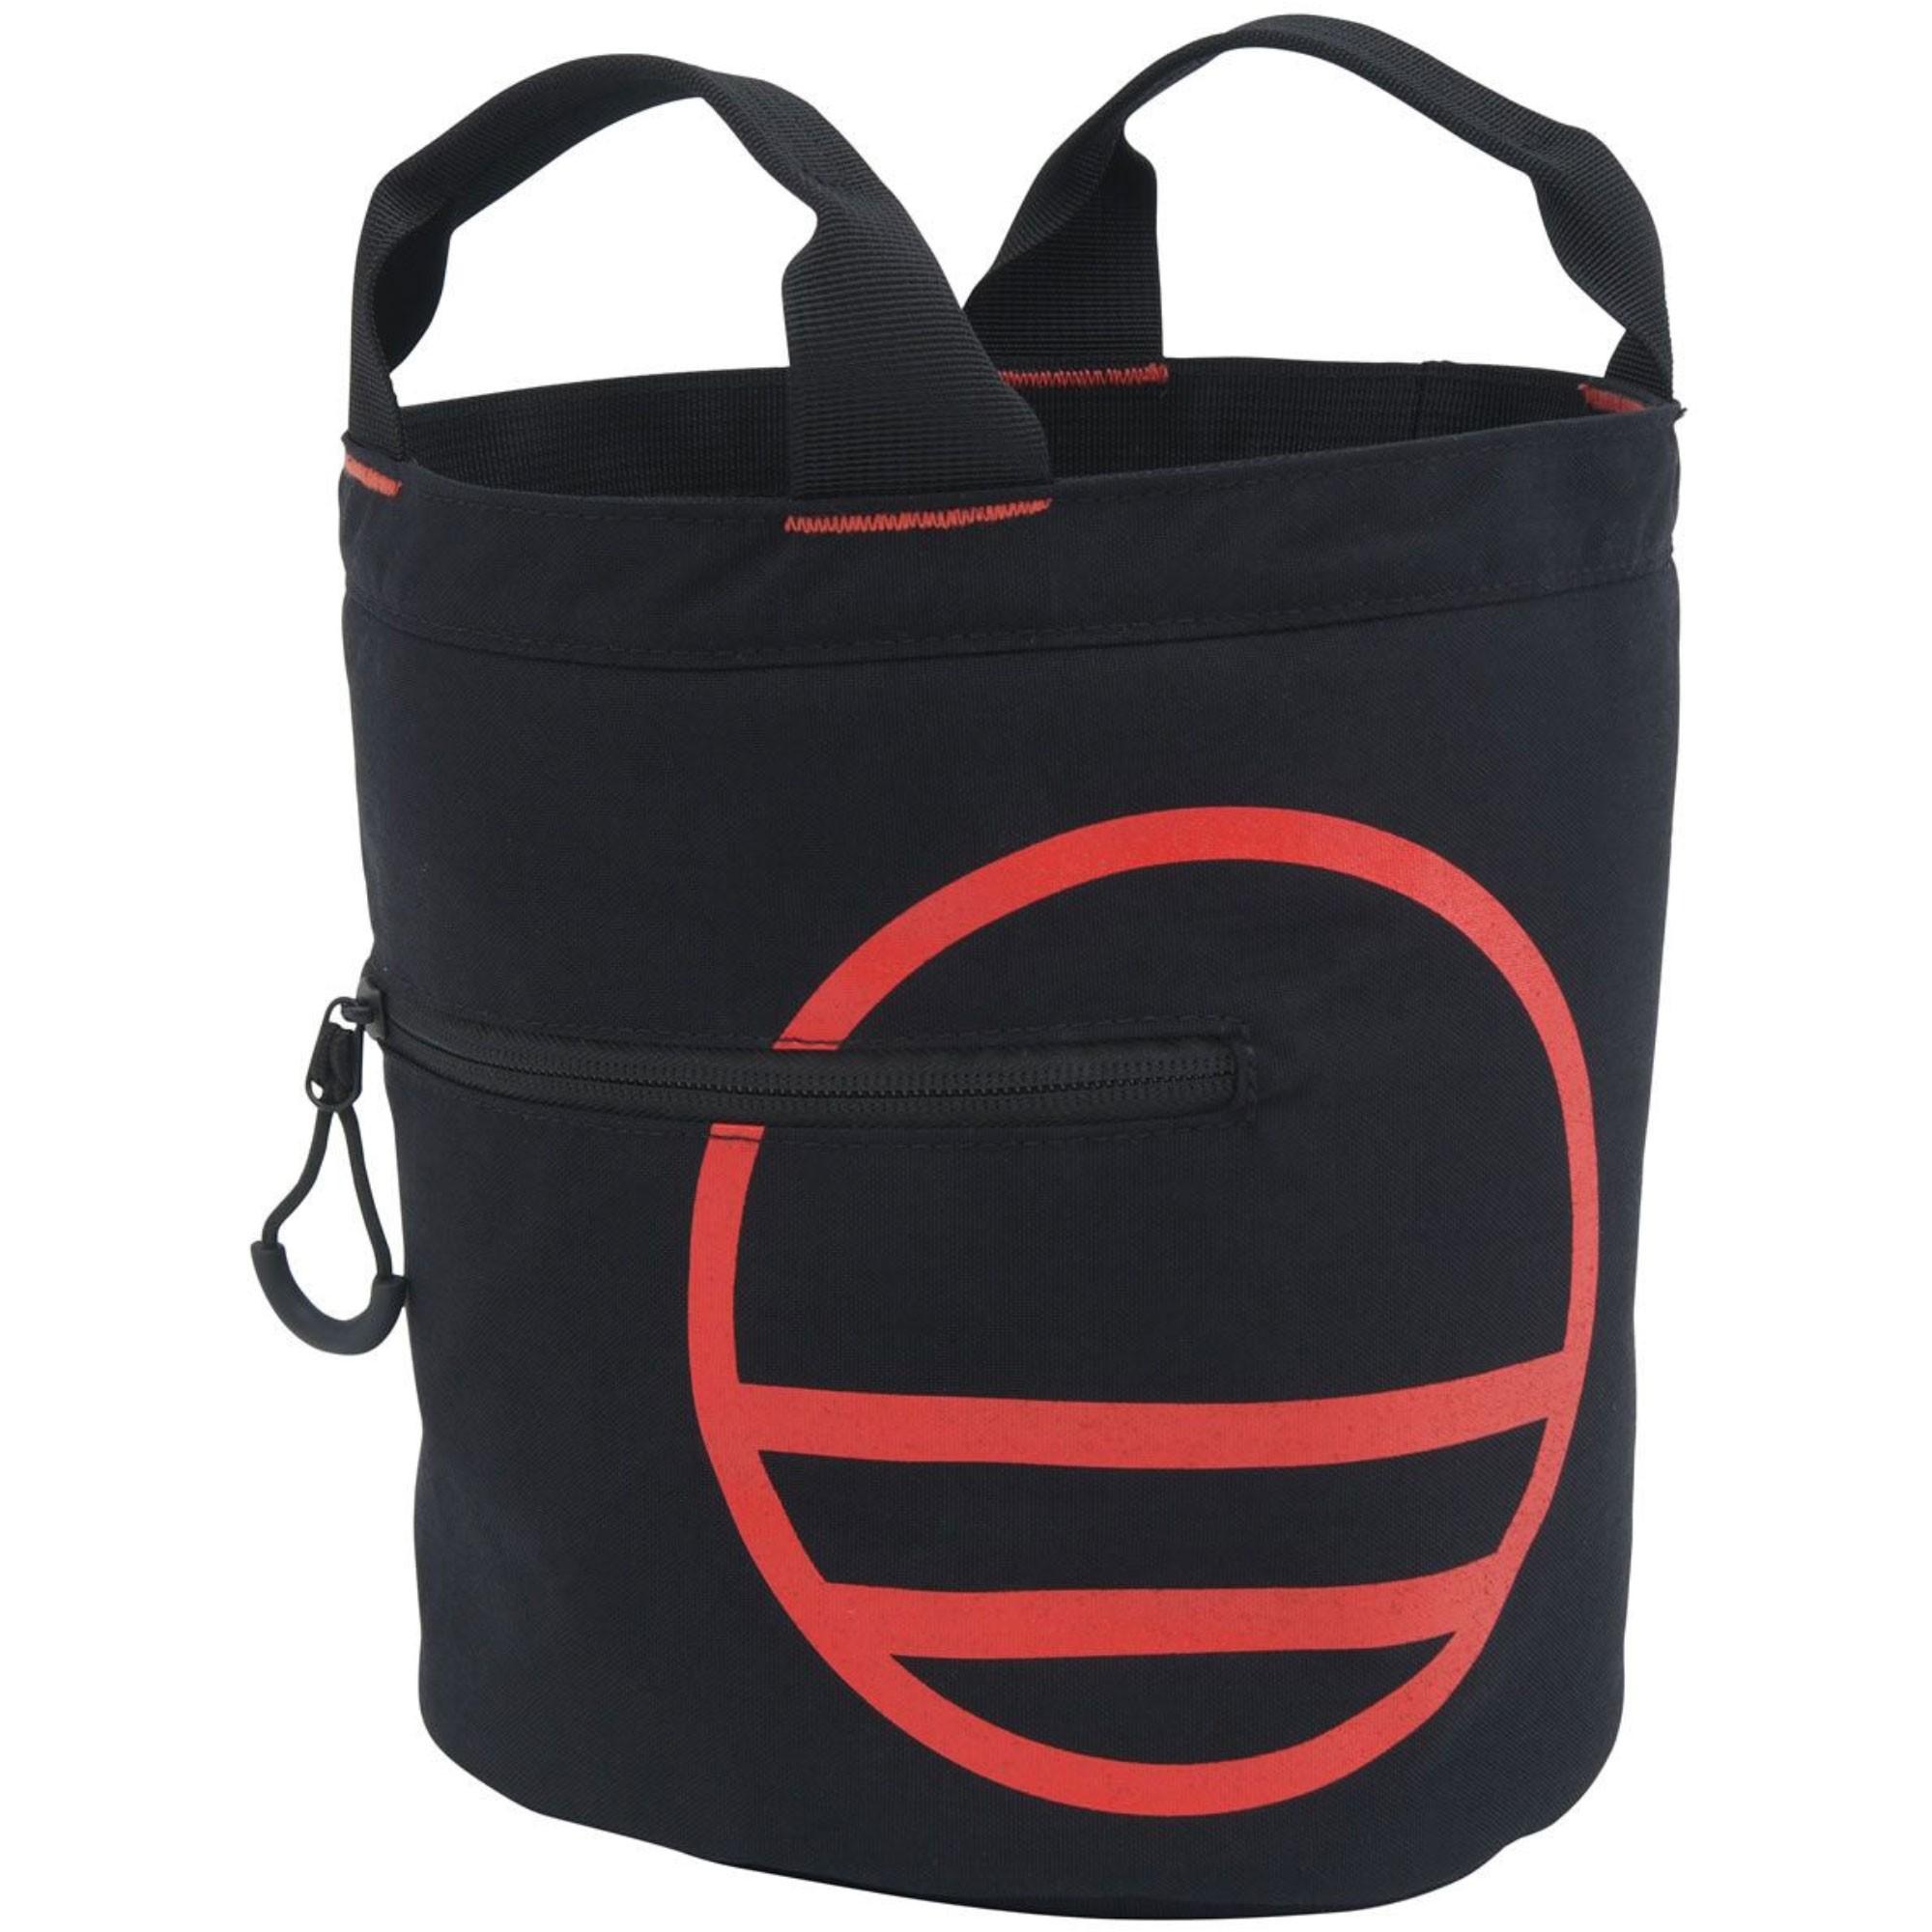 Wild Country Boulder Bag - Black/Orange